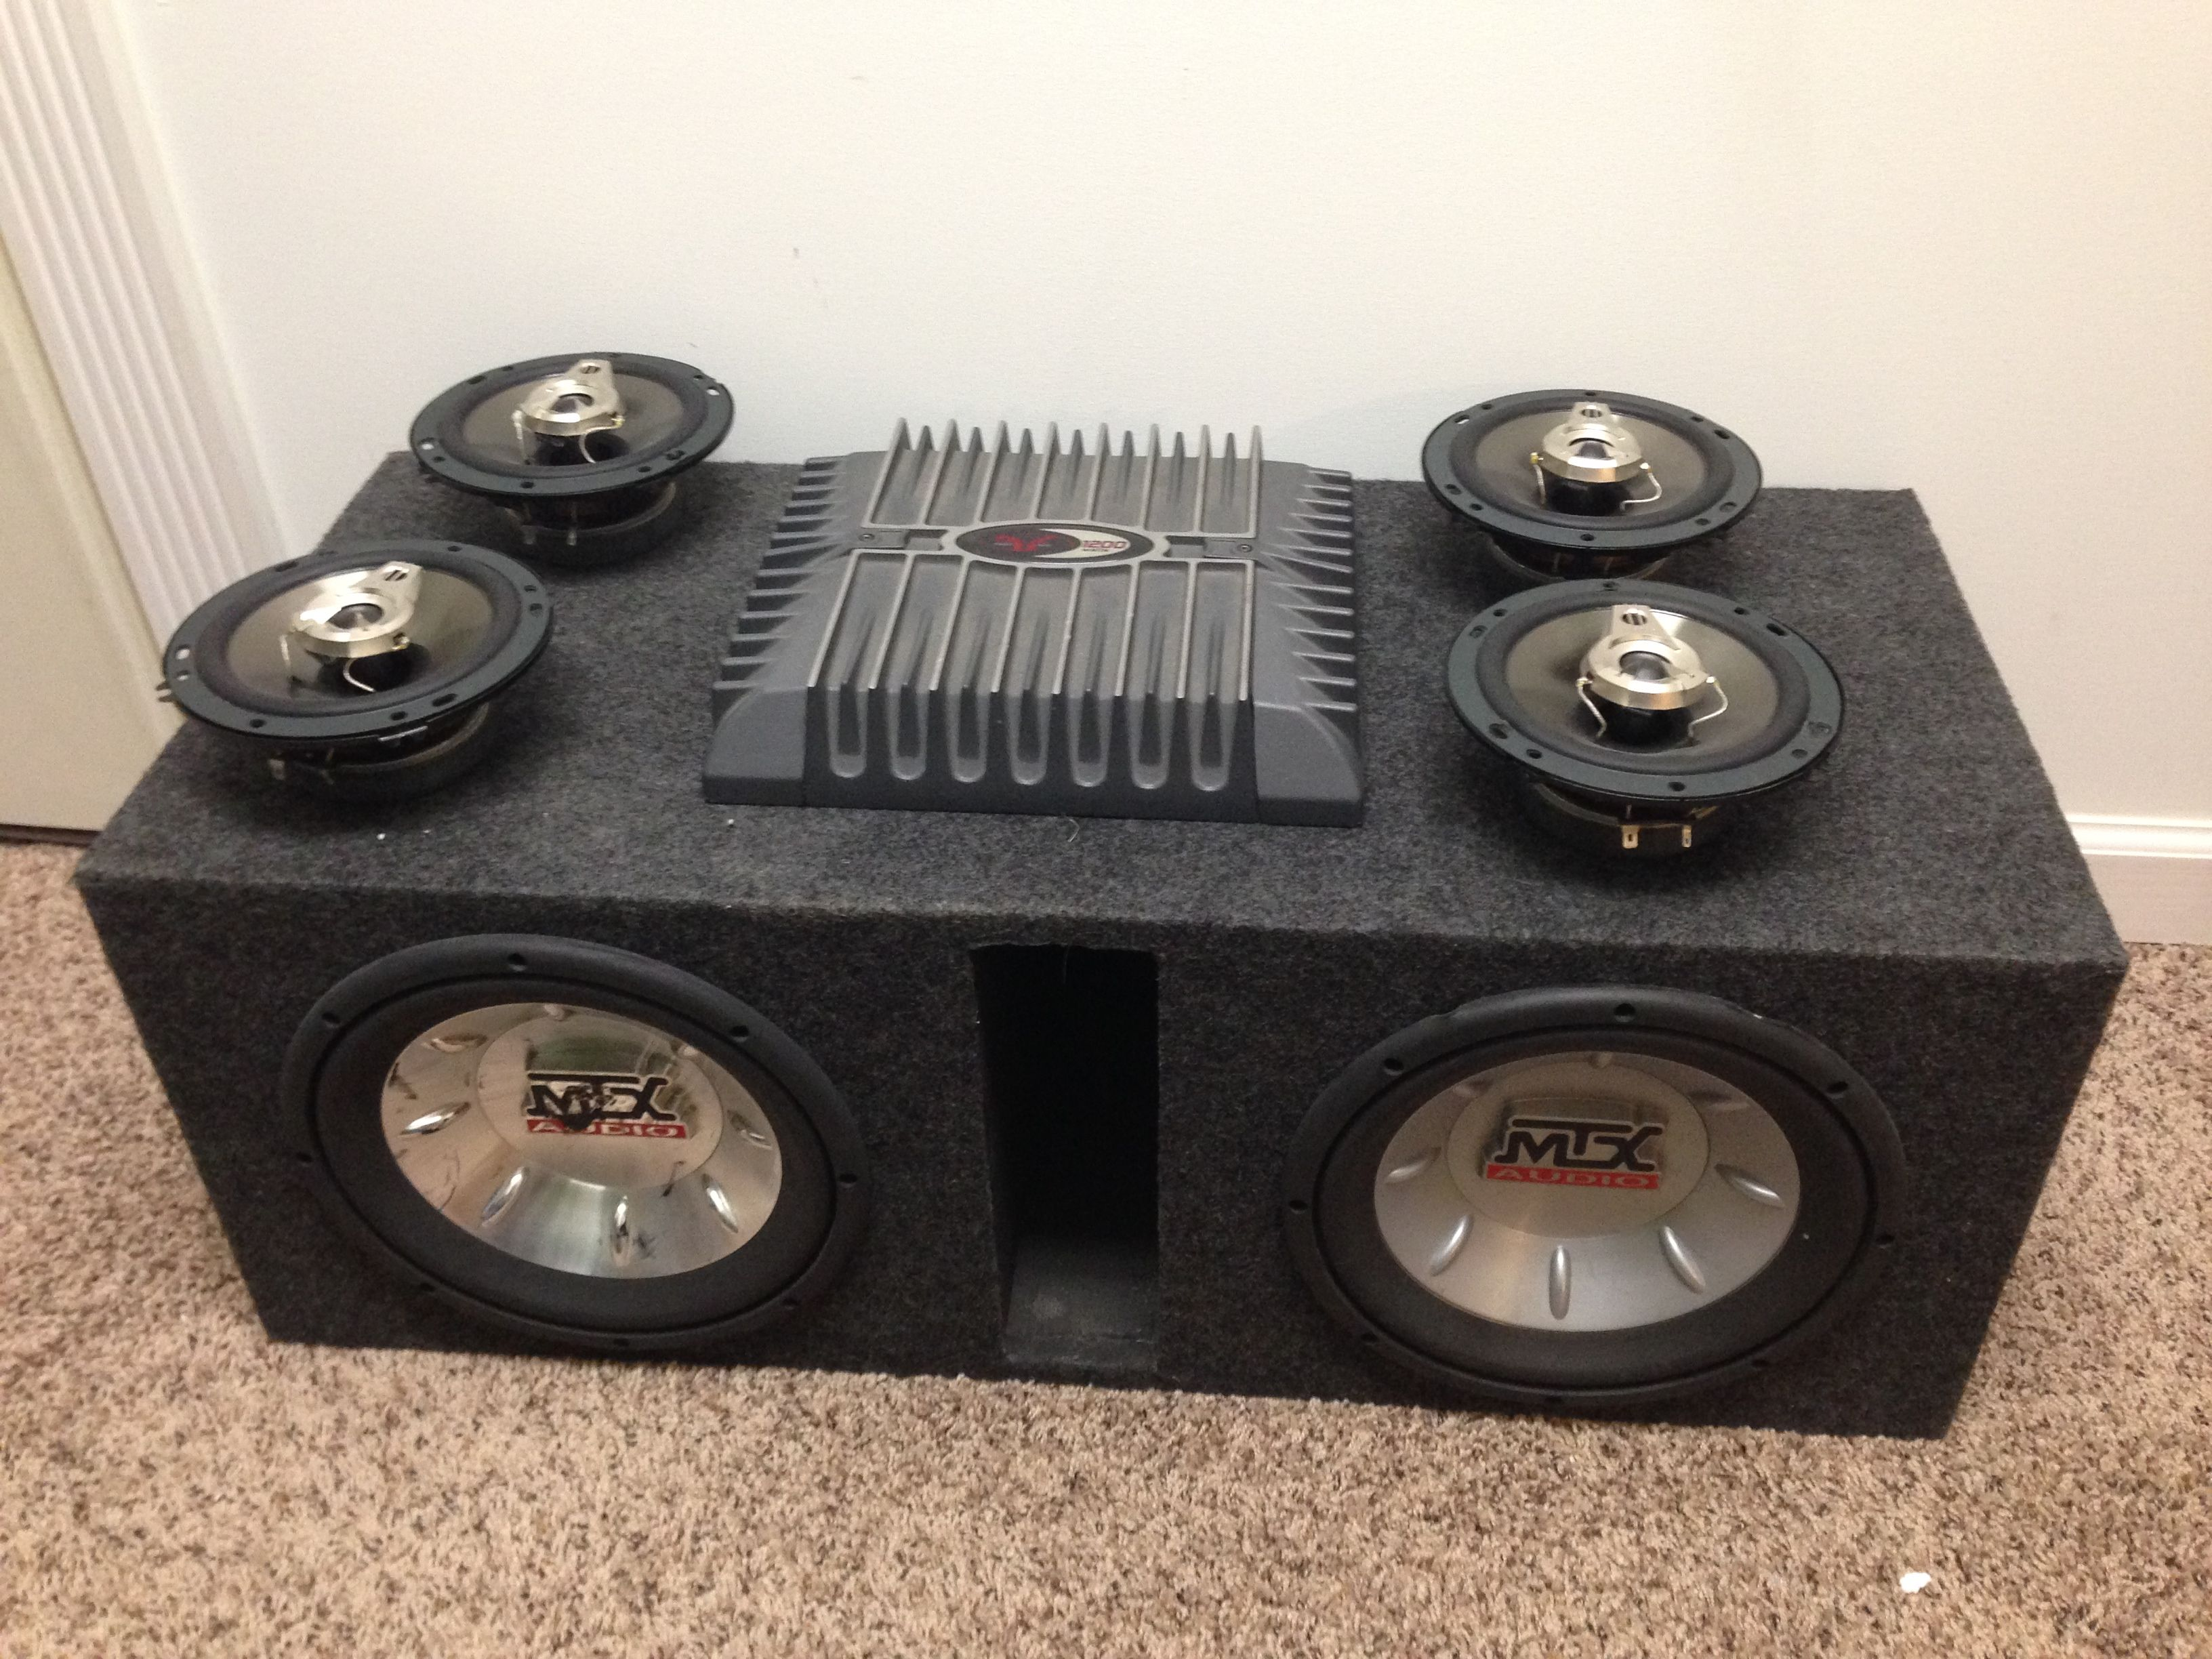 car audio system items for sale pinterest car audio. Black Bedroom Furniture Sets. Home Design Ideas